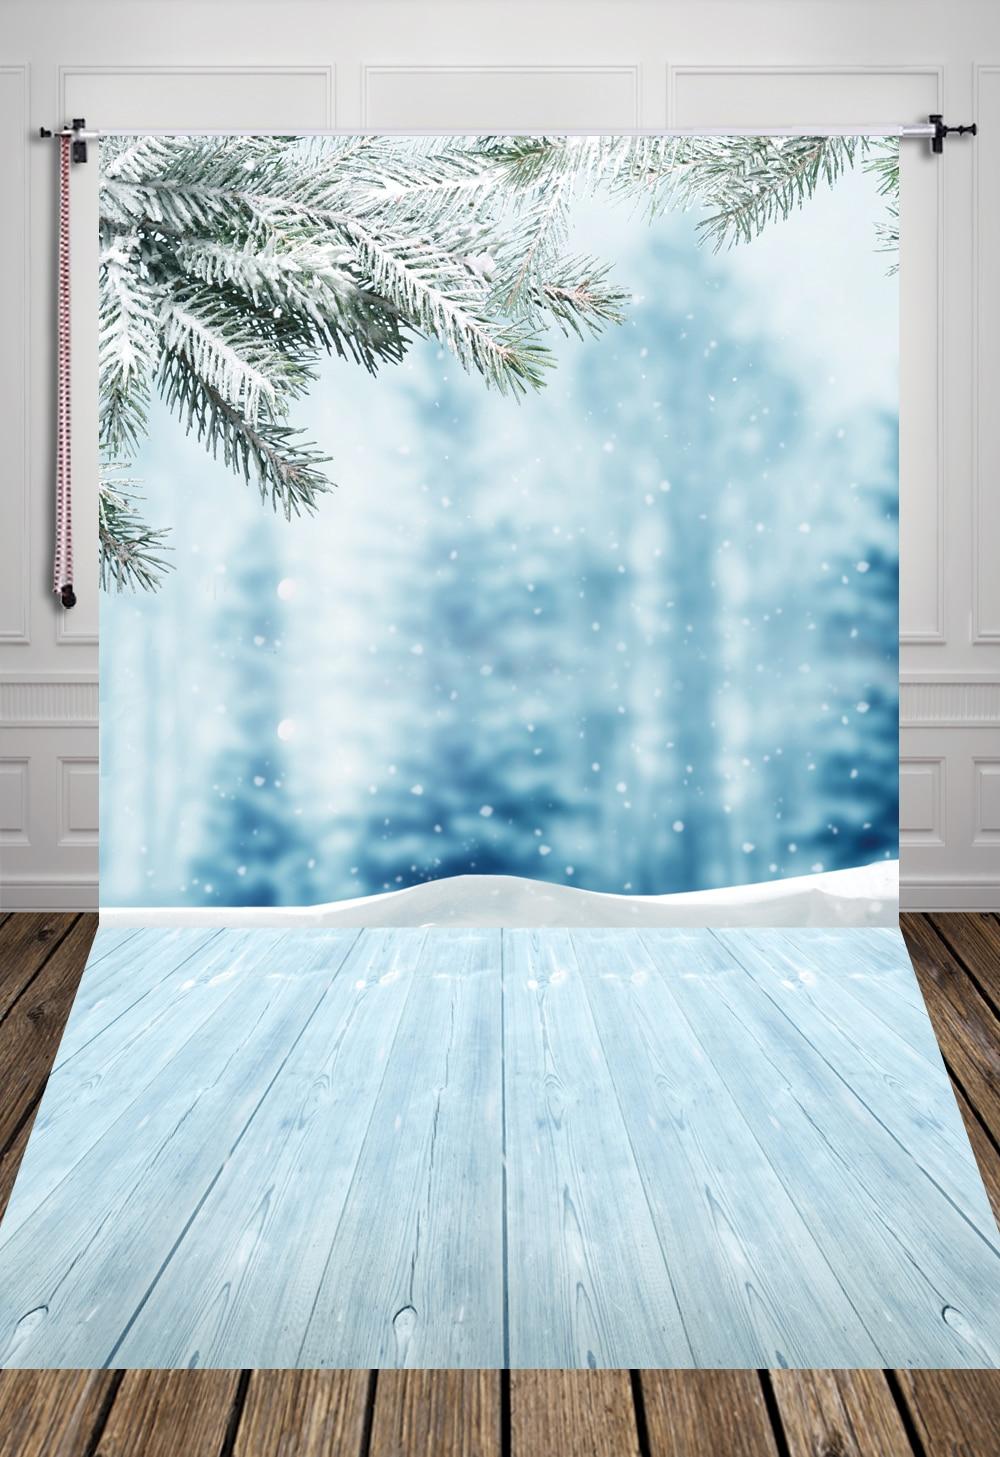 HUAYI Photography Backdrop christmas backdrops Photo Prop Christmas decoration Art Fabric backgrounds D2395